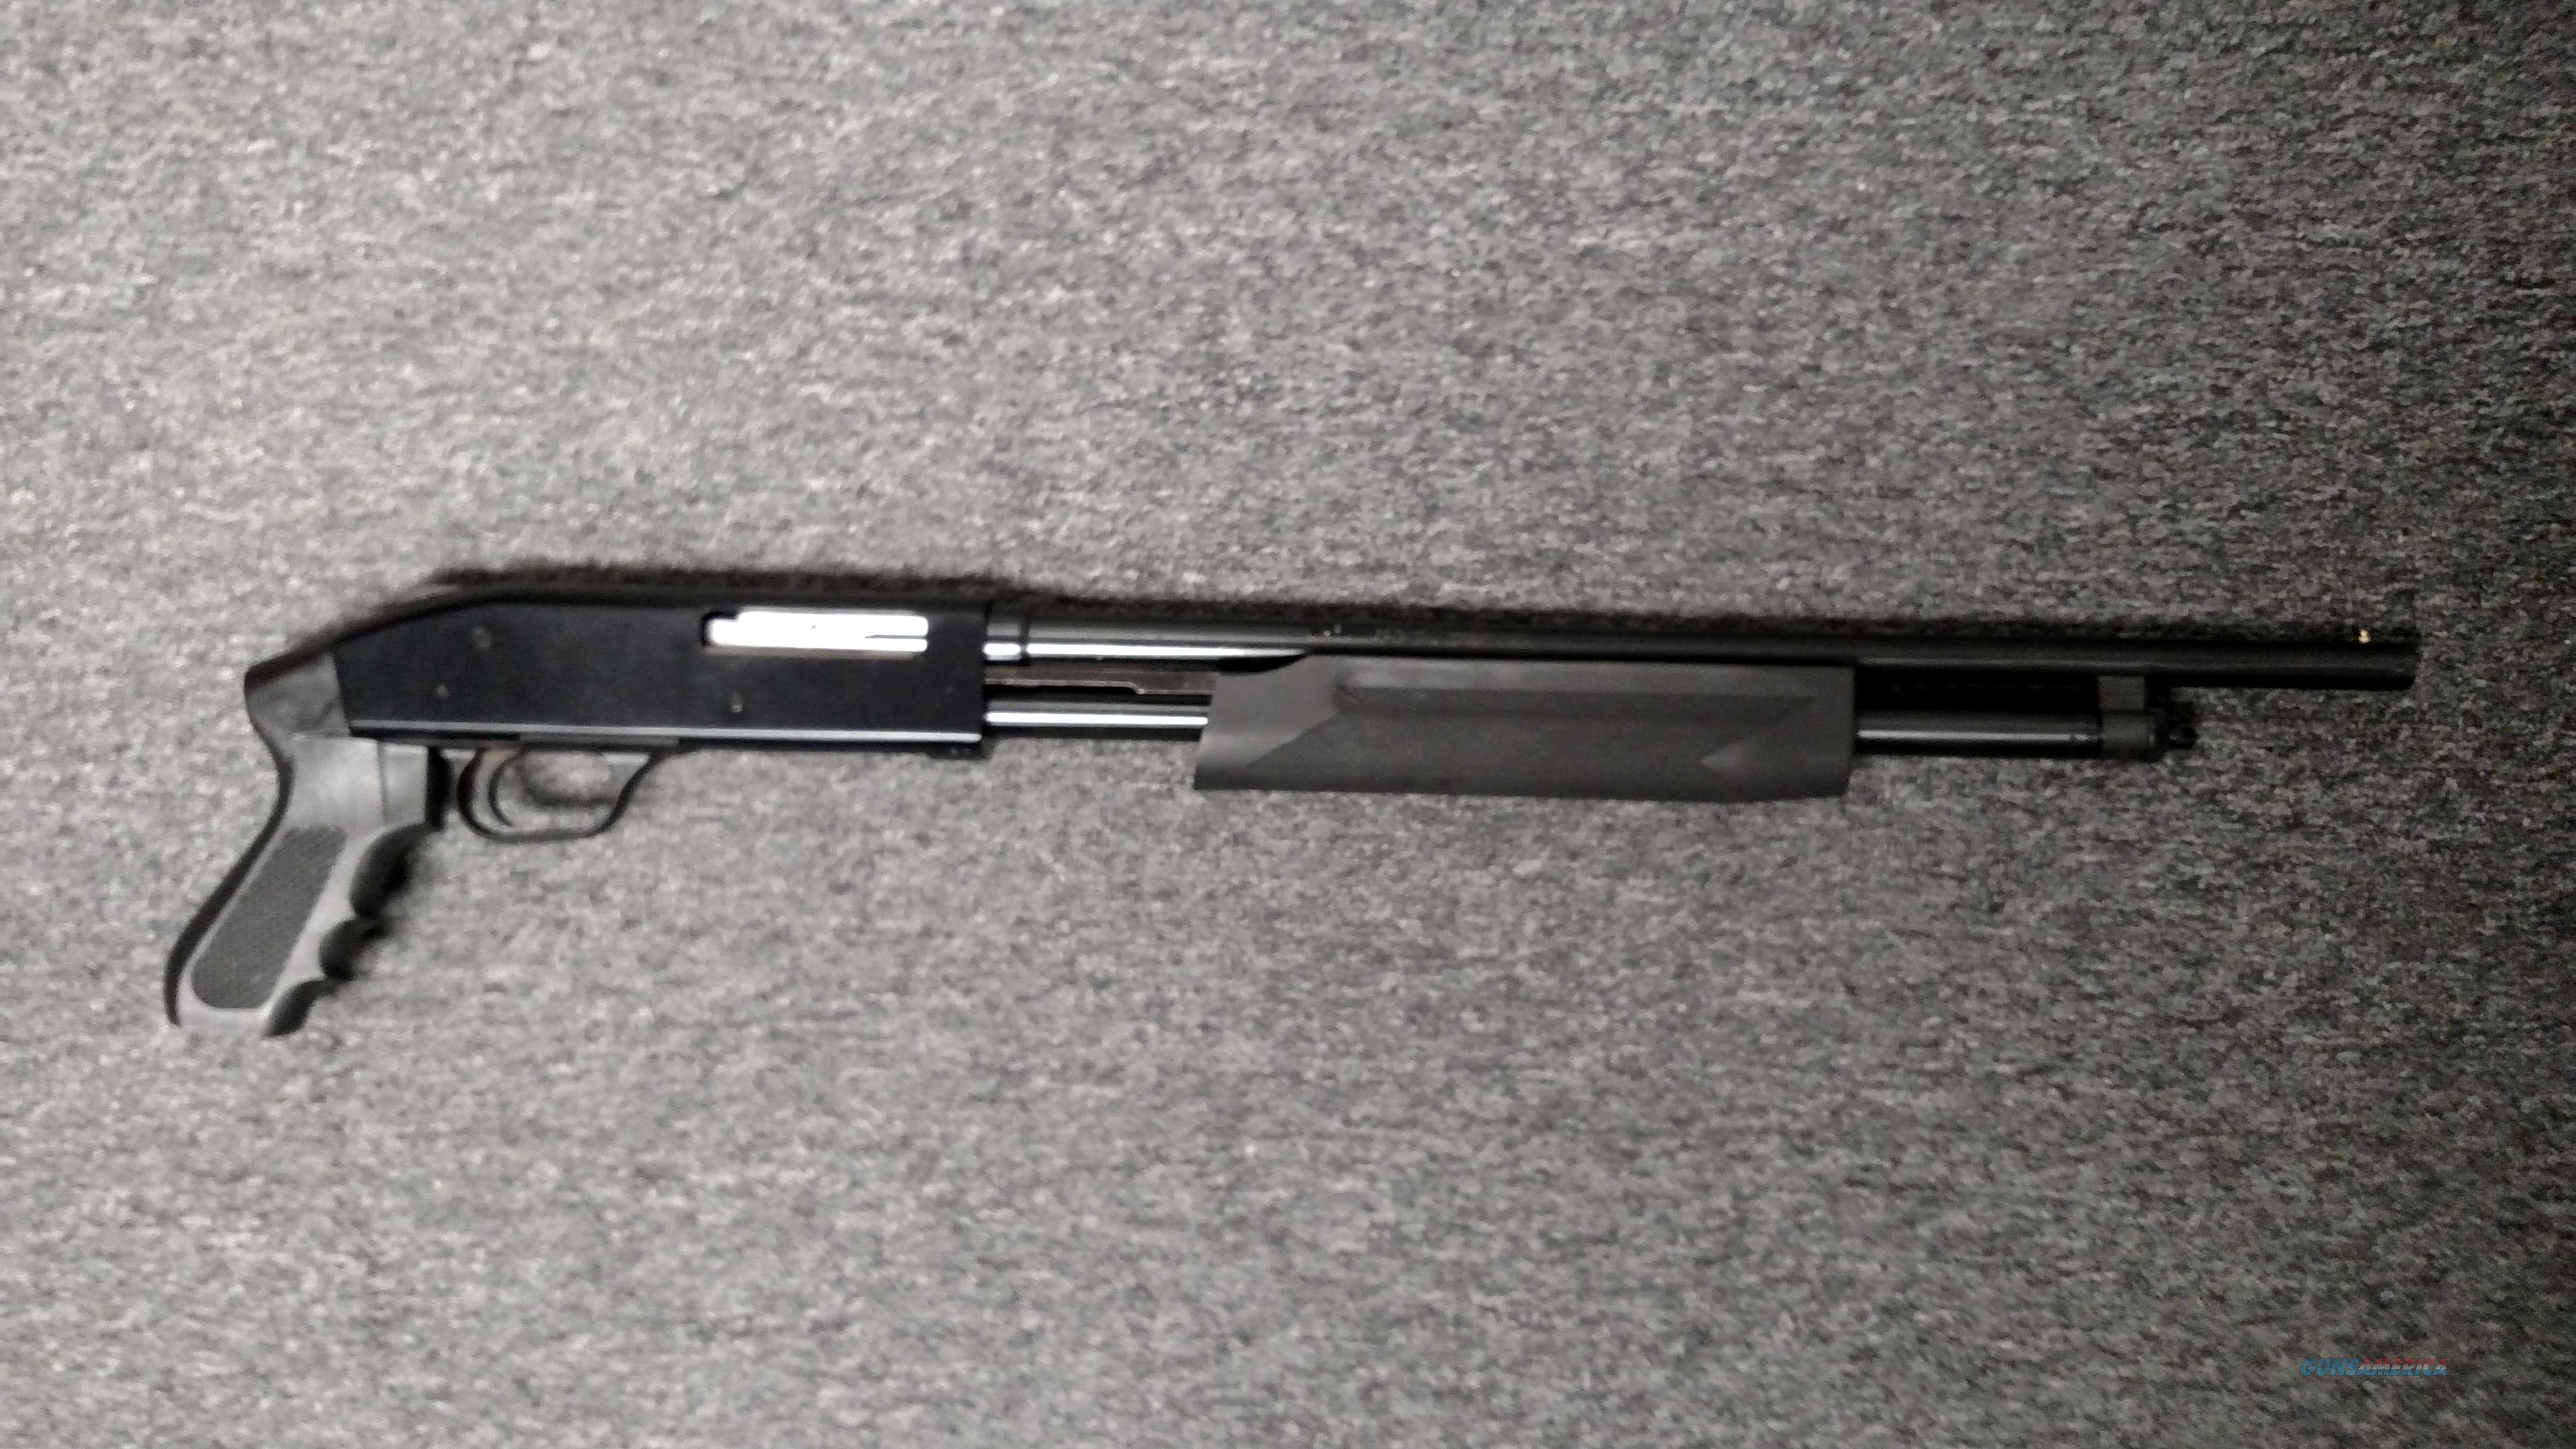 500 Pistol Grip 410 Gauge For Sale